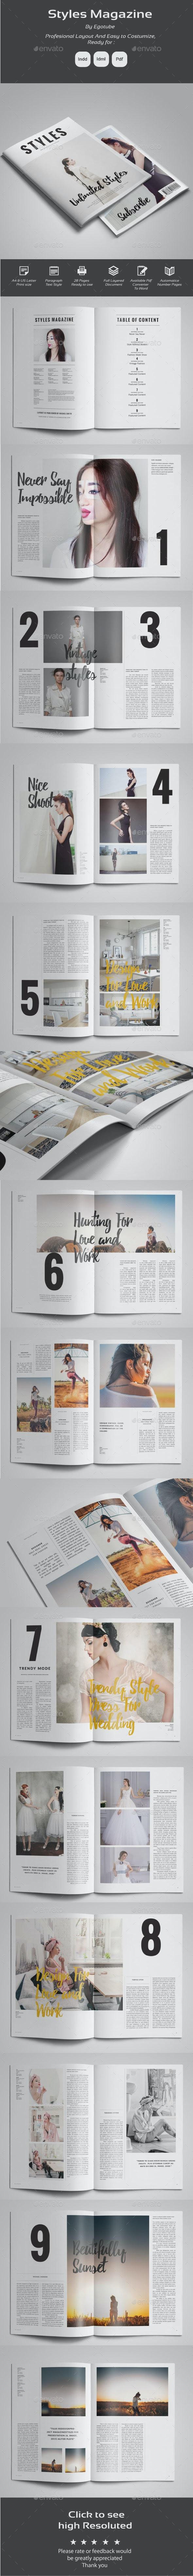 Style Magazine Template - Magazines Print Templates